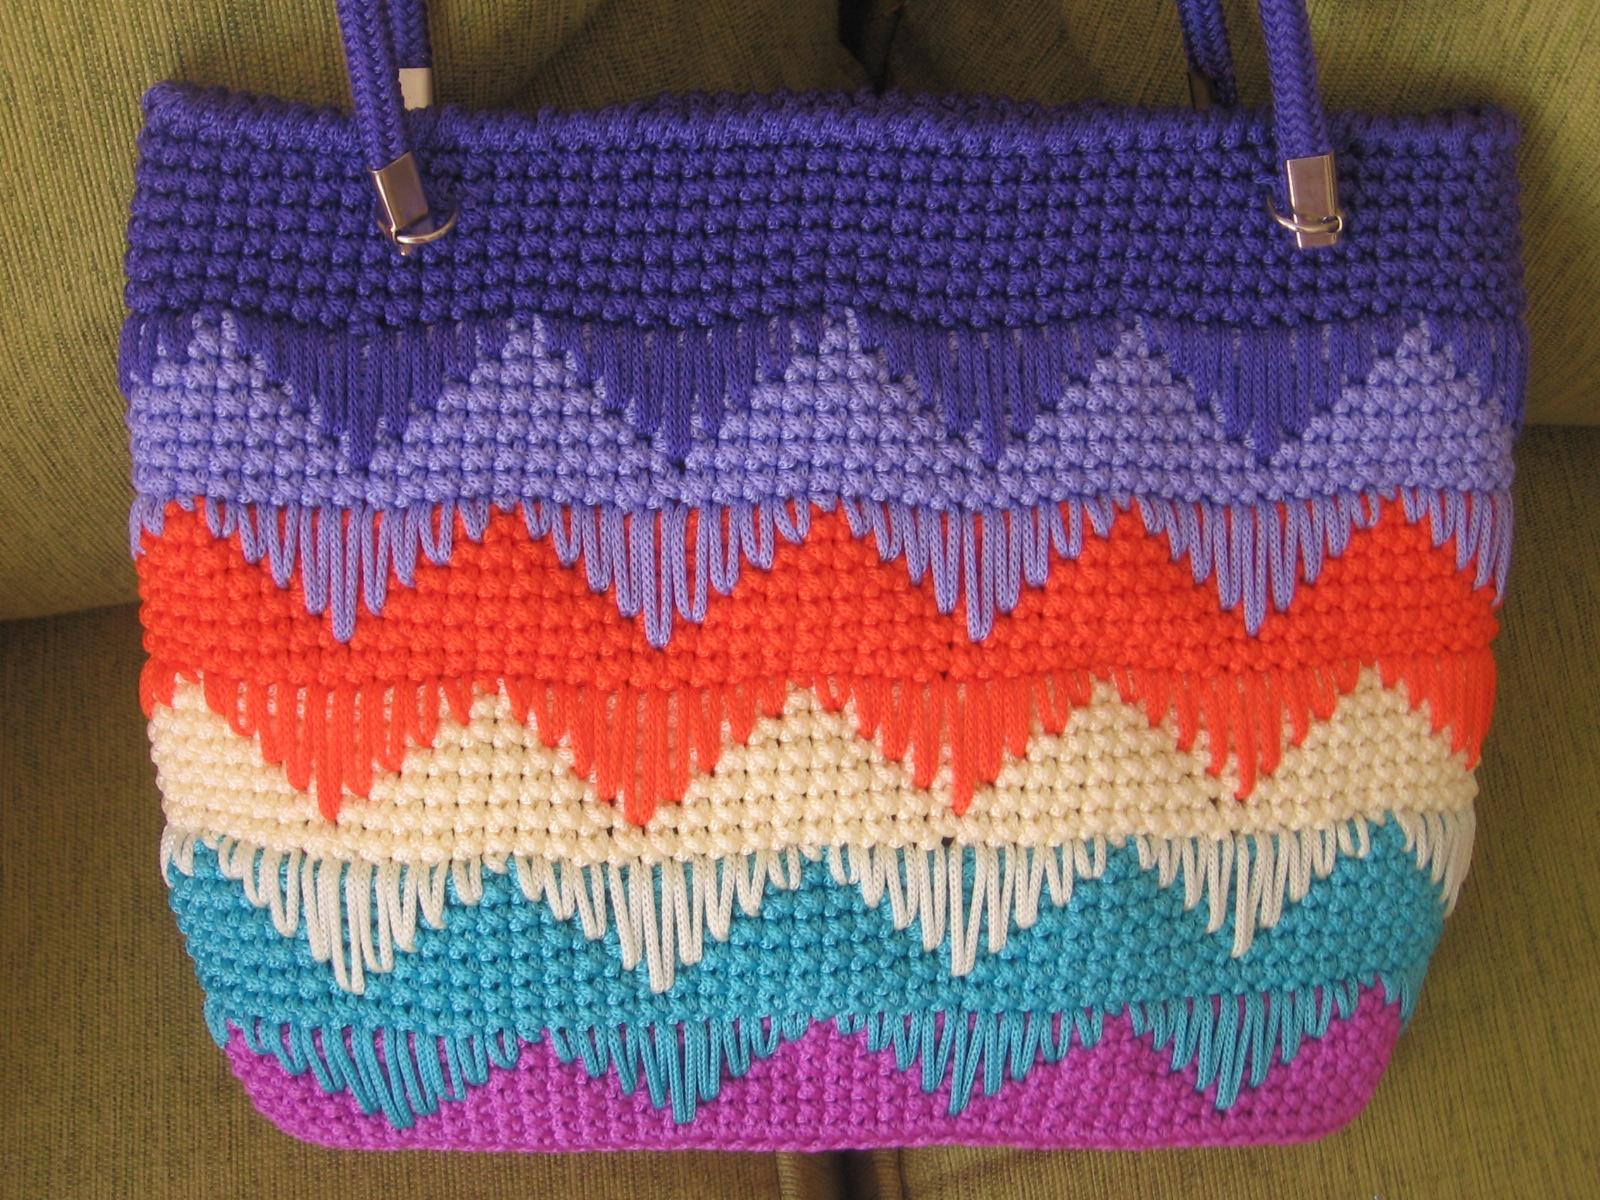 Bolsos Tejidos A Crochet. Bolso Tejido A Crochet Con Bolsas Plsticas ...